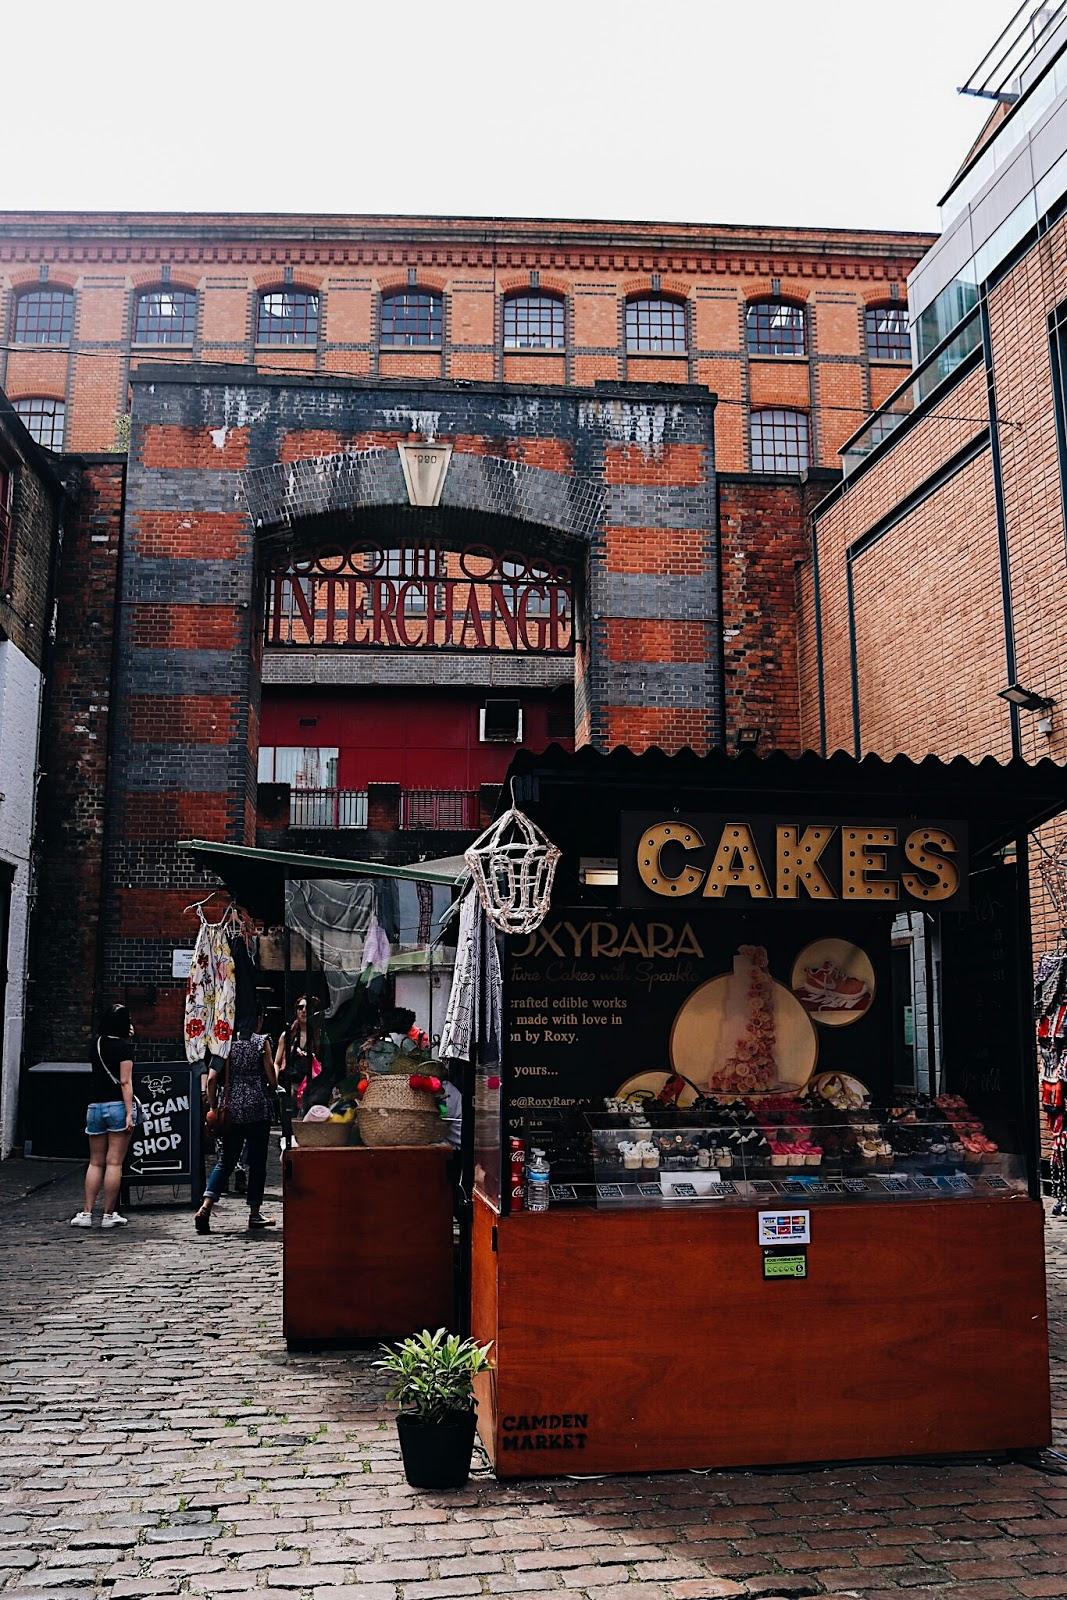 pauline-dress-blog-mode-deco-lifestyle-travel-voyage-europe-londres-angleterre-idees-visites-parcours-touristique-instagram-instagrammable-lieux-camden-cakes